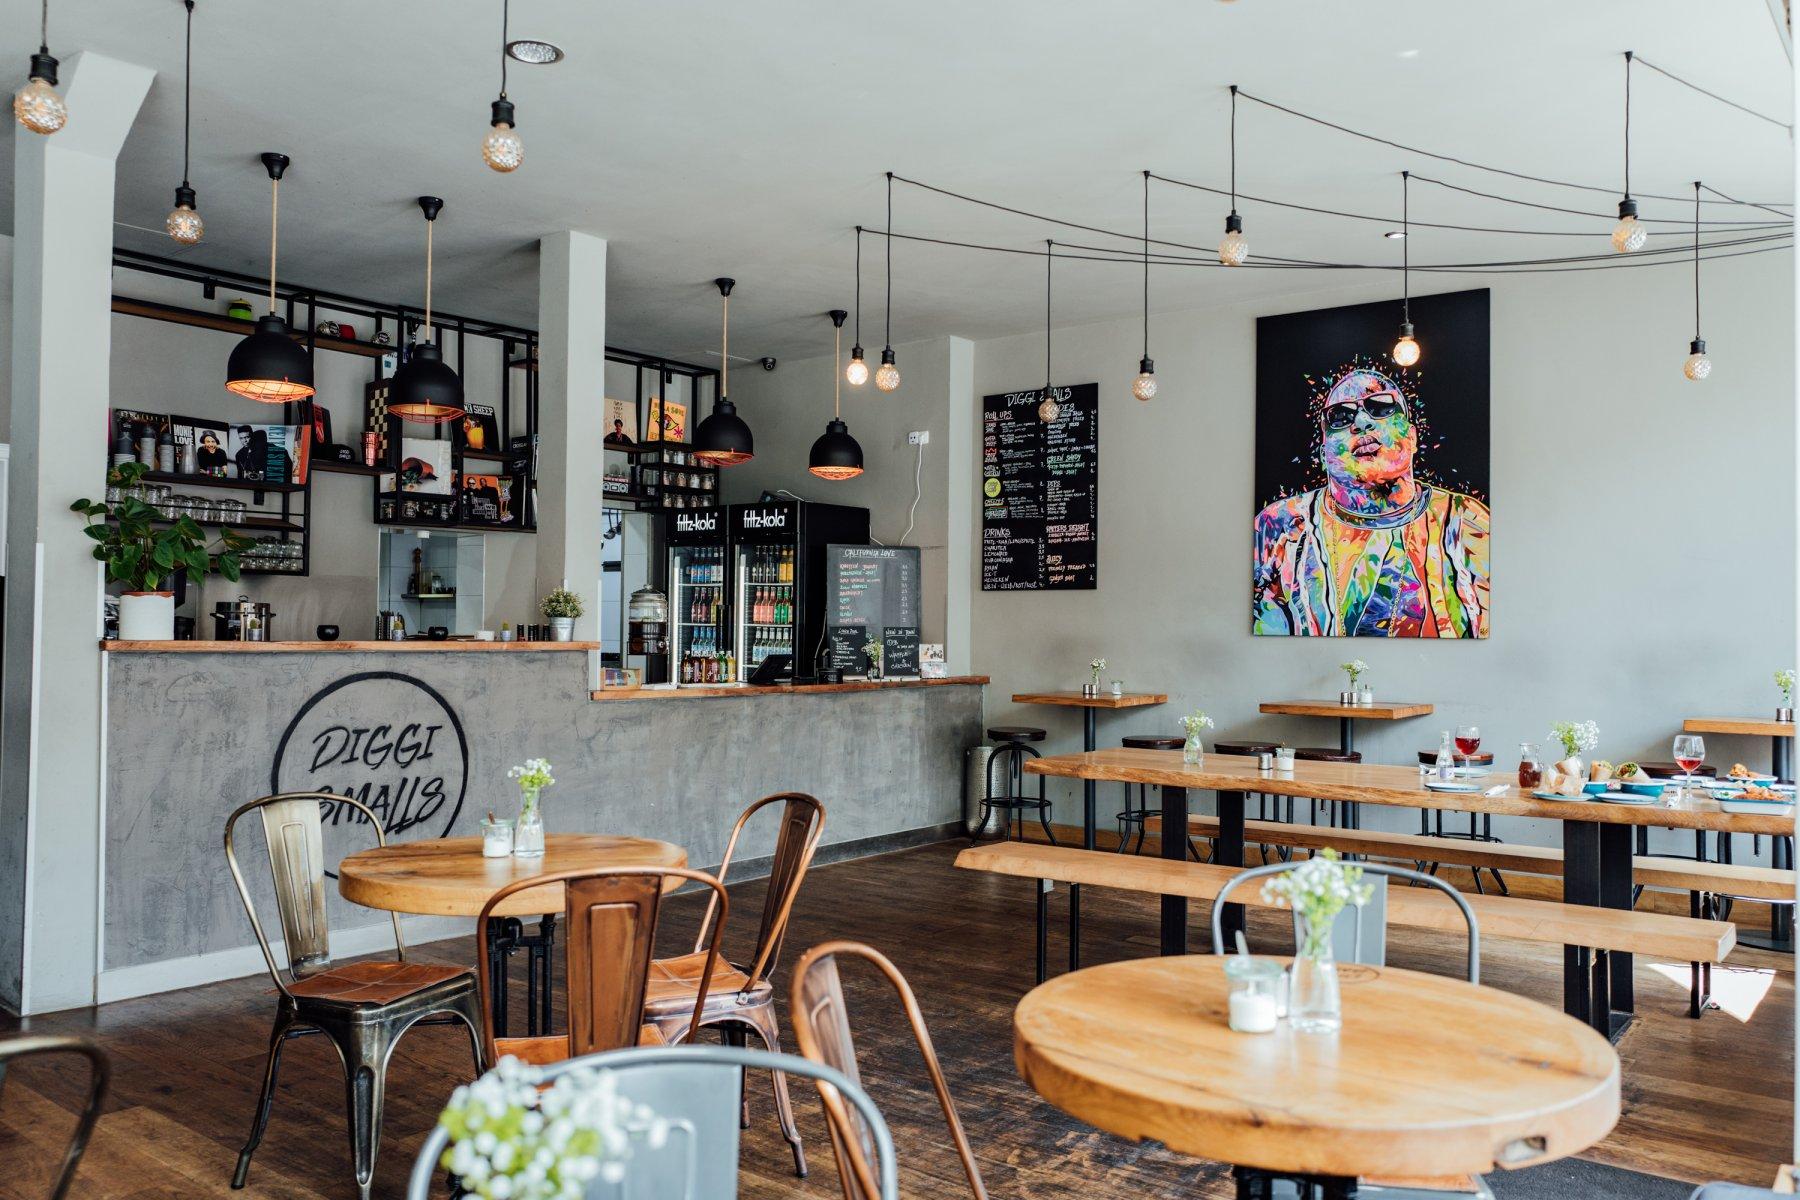 Geheimtipp Hamburg Essen & Trinken Restaurant Grindel Diggi Smalls Lisa Knauer 10